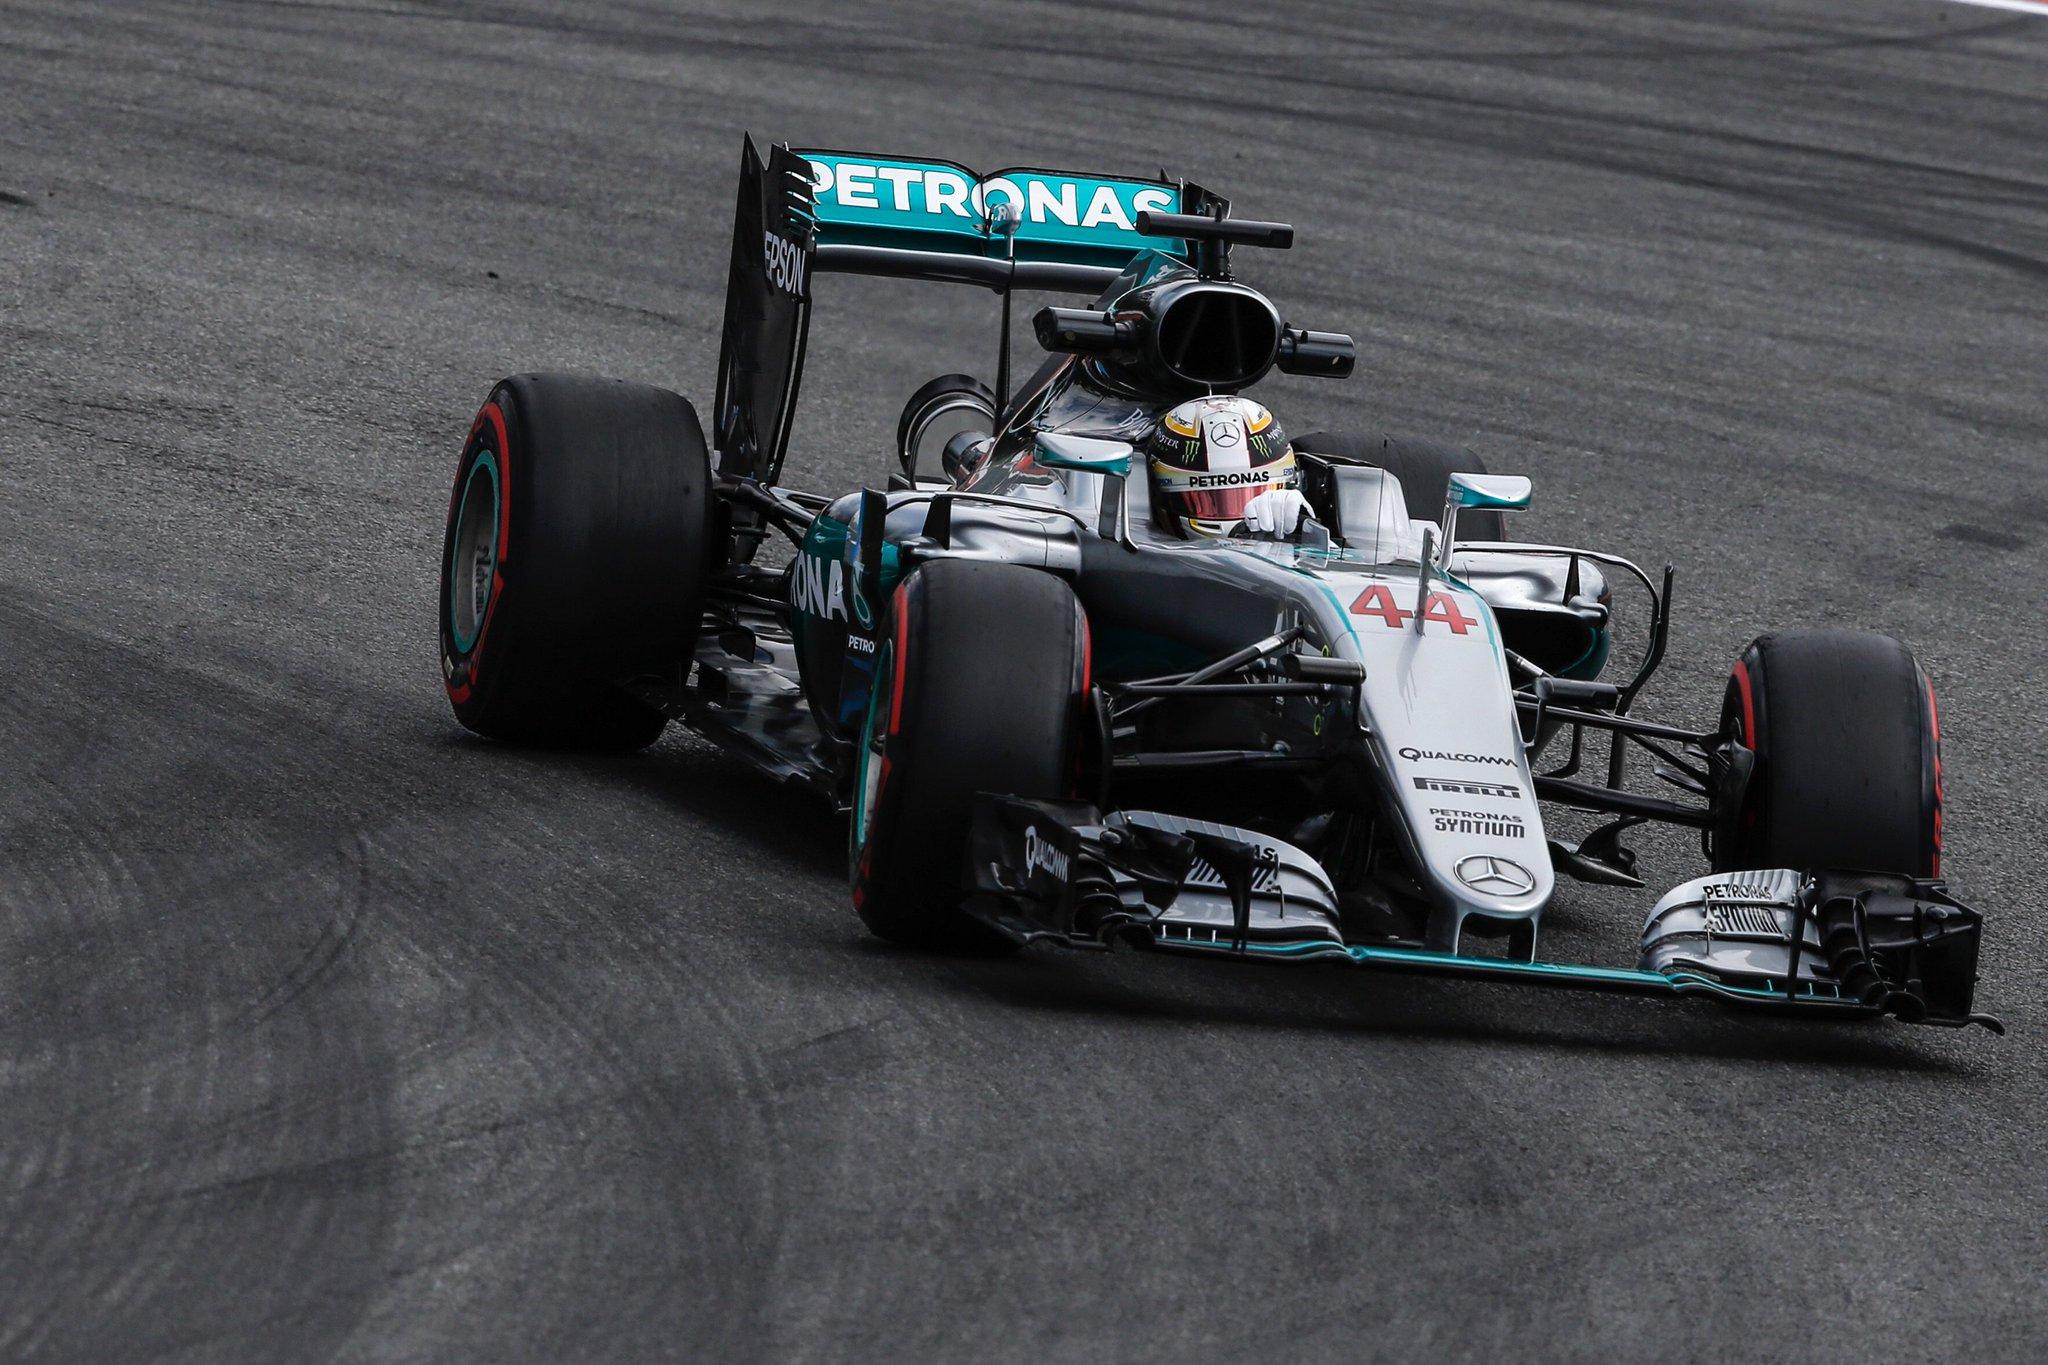 #FP3 up next, who's tuning in!? #GermanGP #F1 #TeamLH #F1istZurueck @MercedesAMGF1 📸 x @suttonimages https://t.co/tODmlct9FT